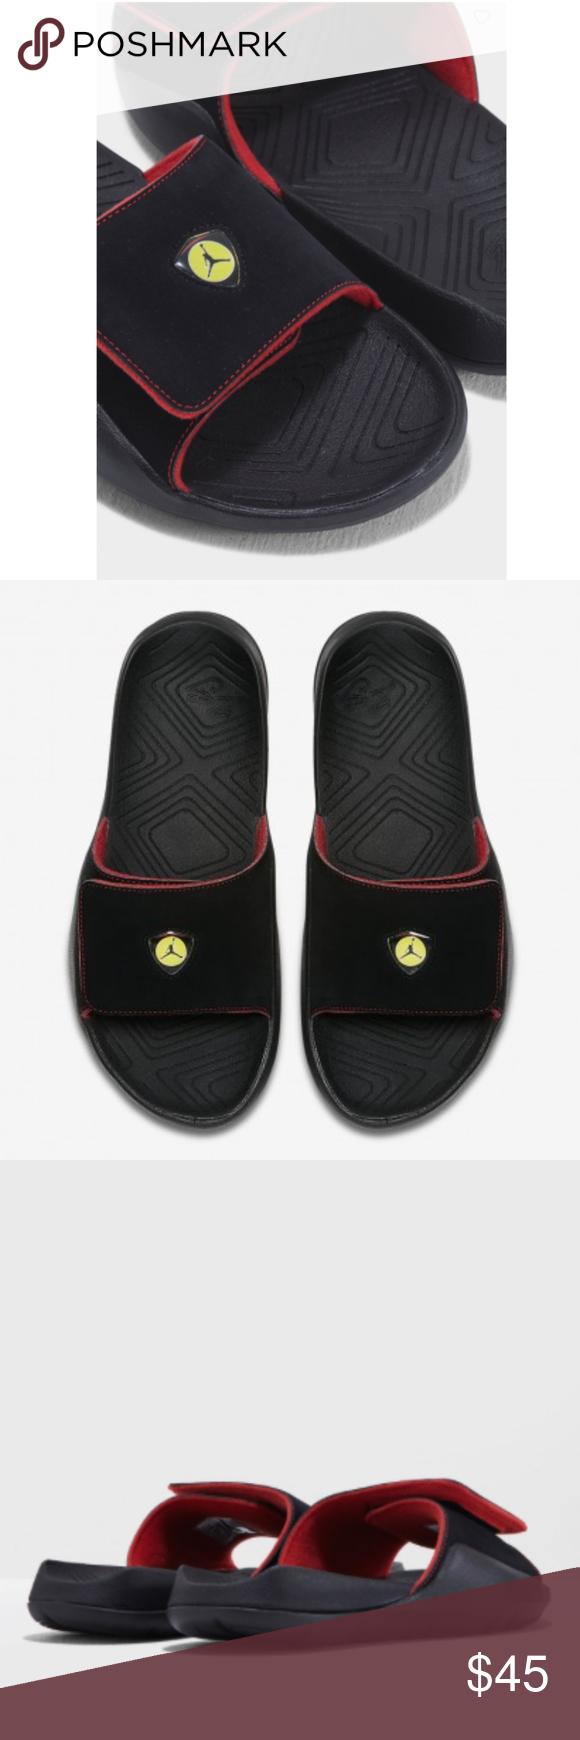 c226b8559c3c Nike JORDAN HYDRO 7 Men s Sandals The Jordan Hydro 7 Men s Slide provides a  cushioned footbed